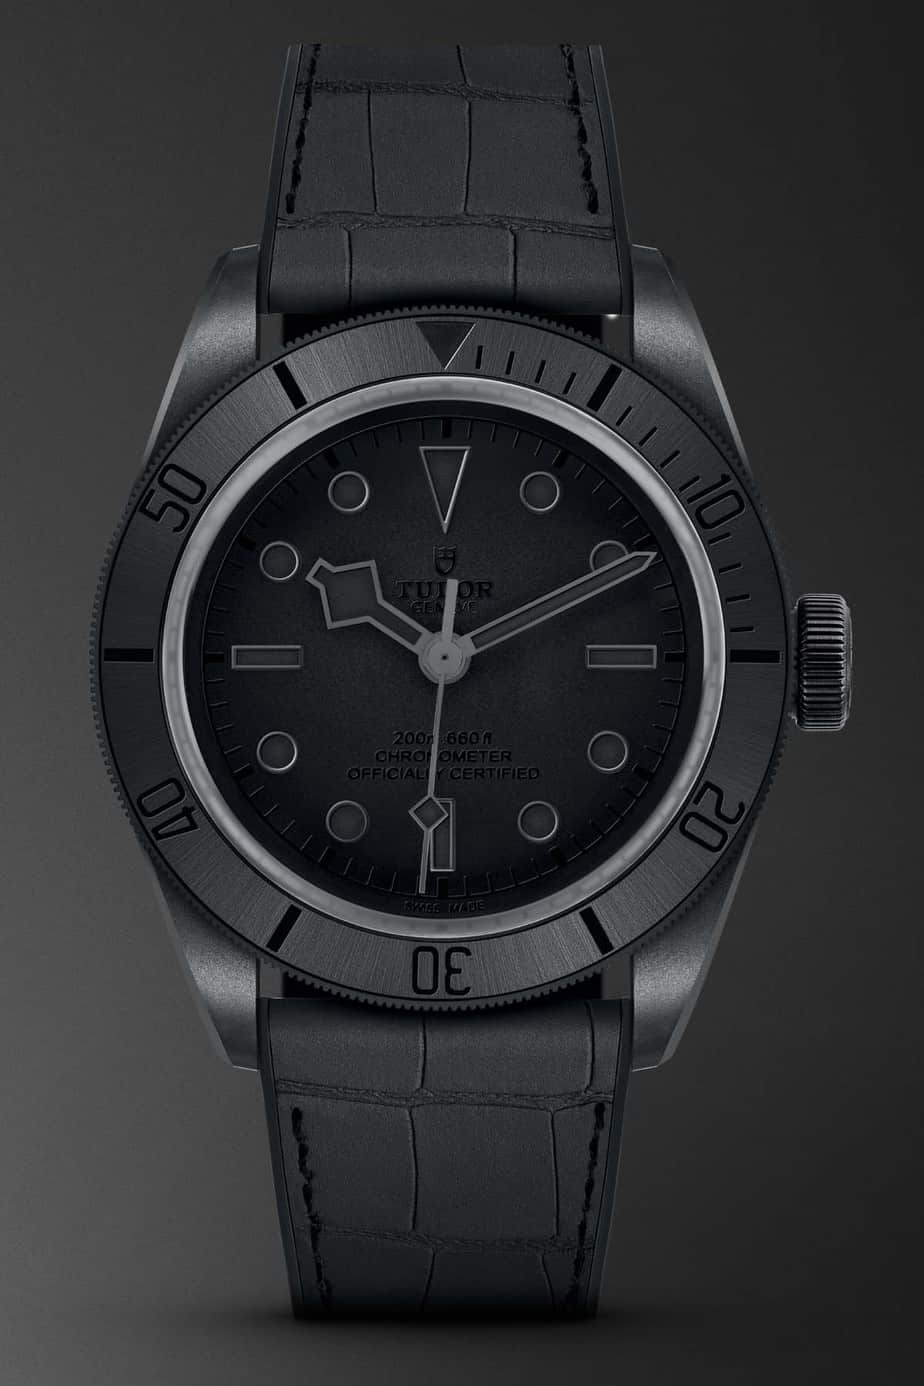 tudor black bay PVD ceramic only watch 2019